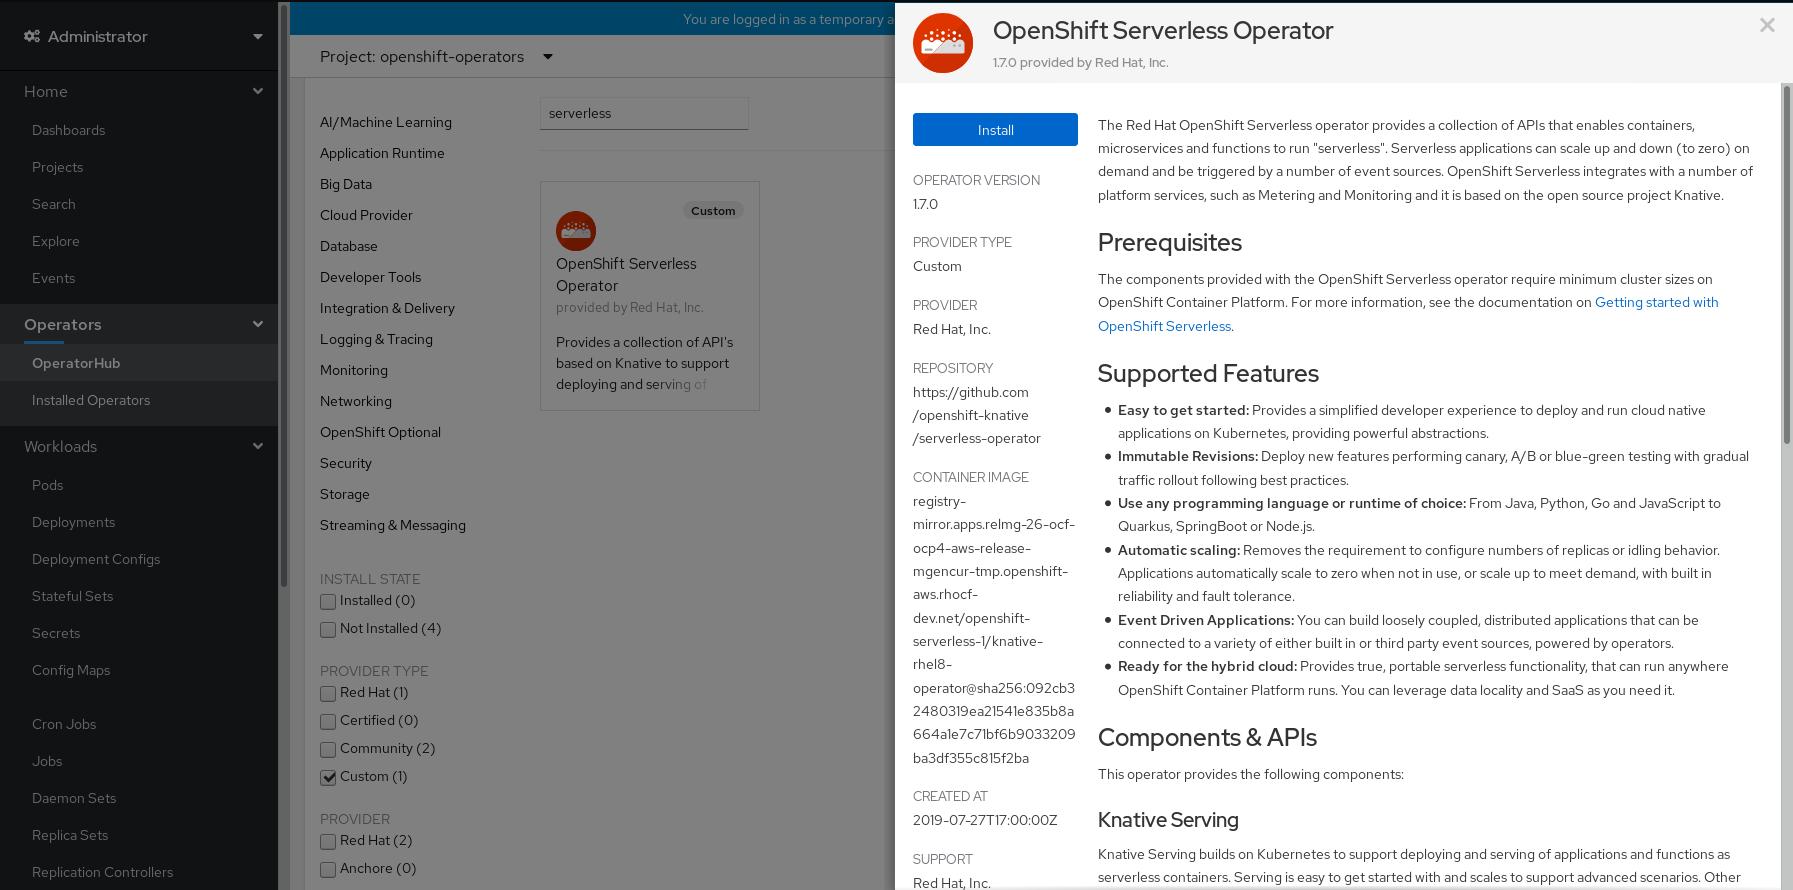 OpenShift Serverless Operator の情報